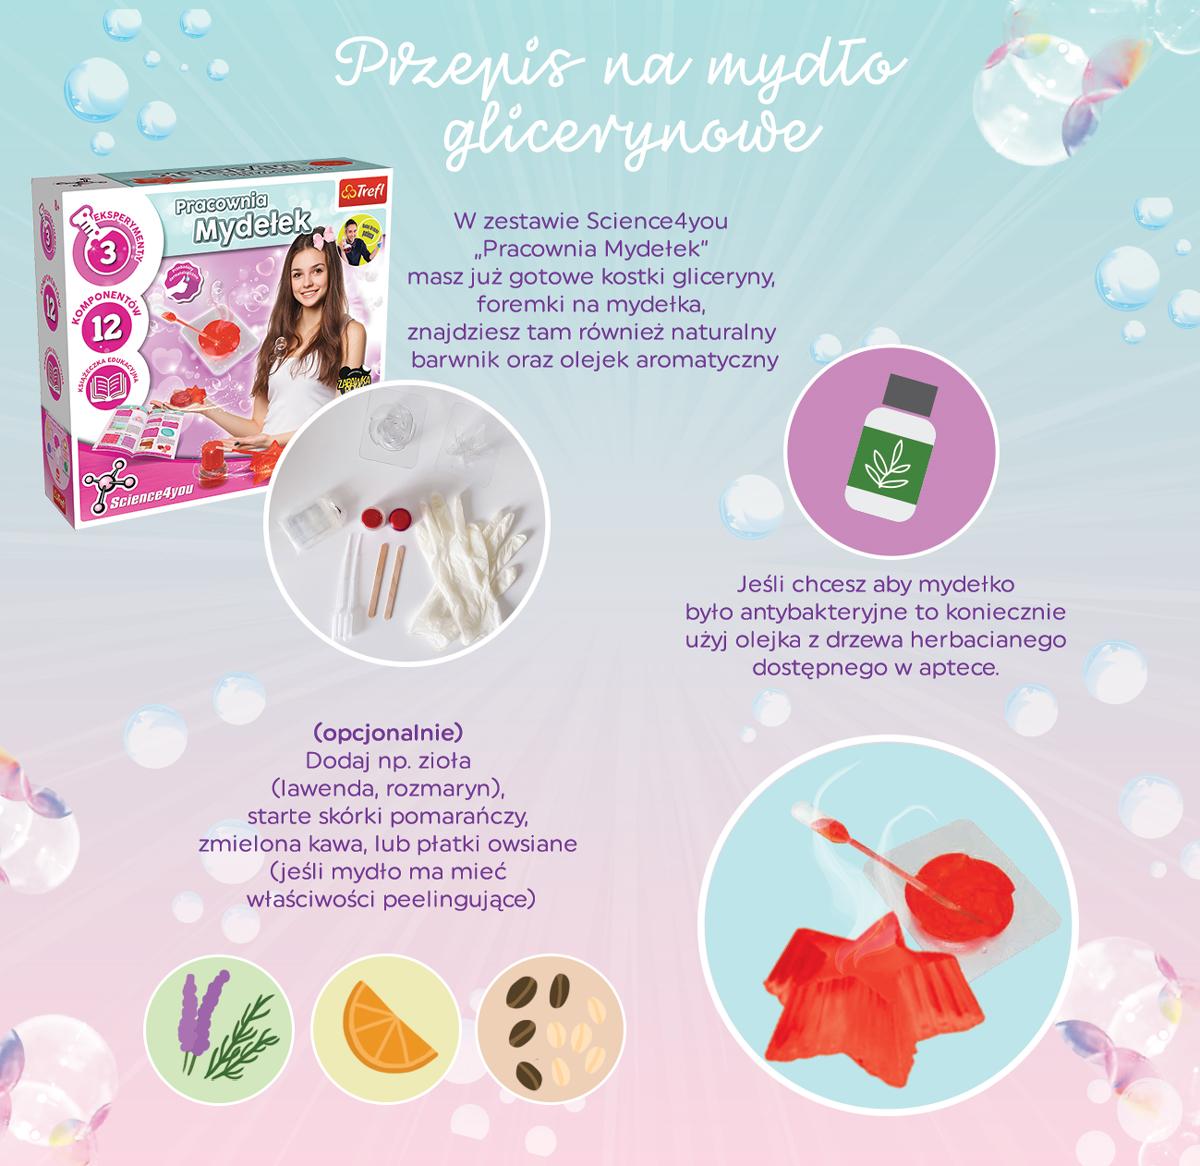 Science4you - pracownia mydełek